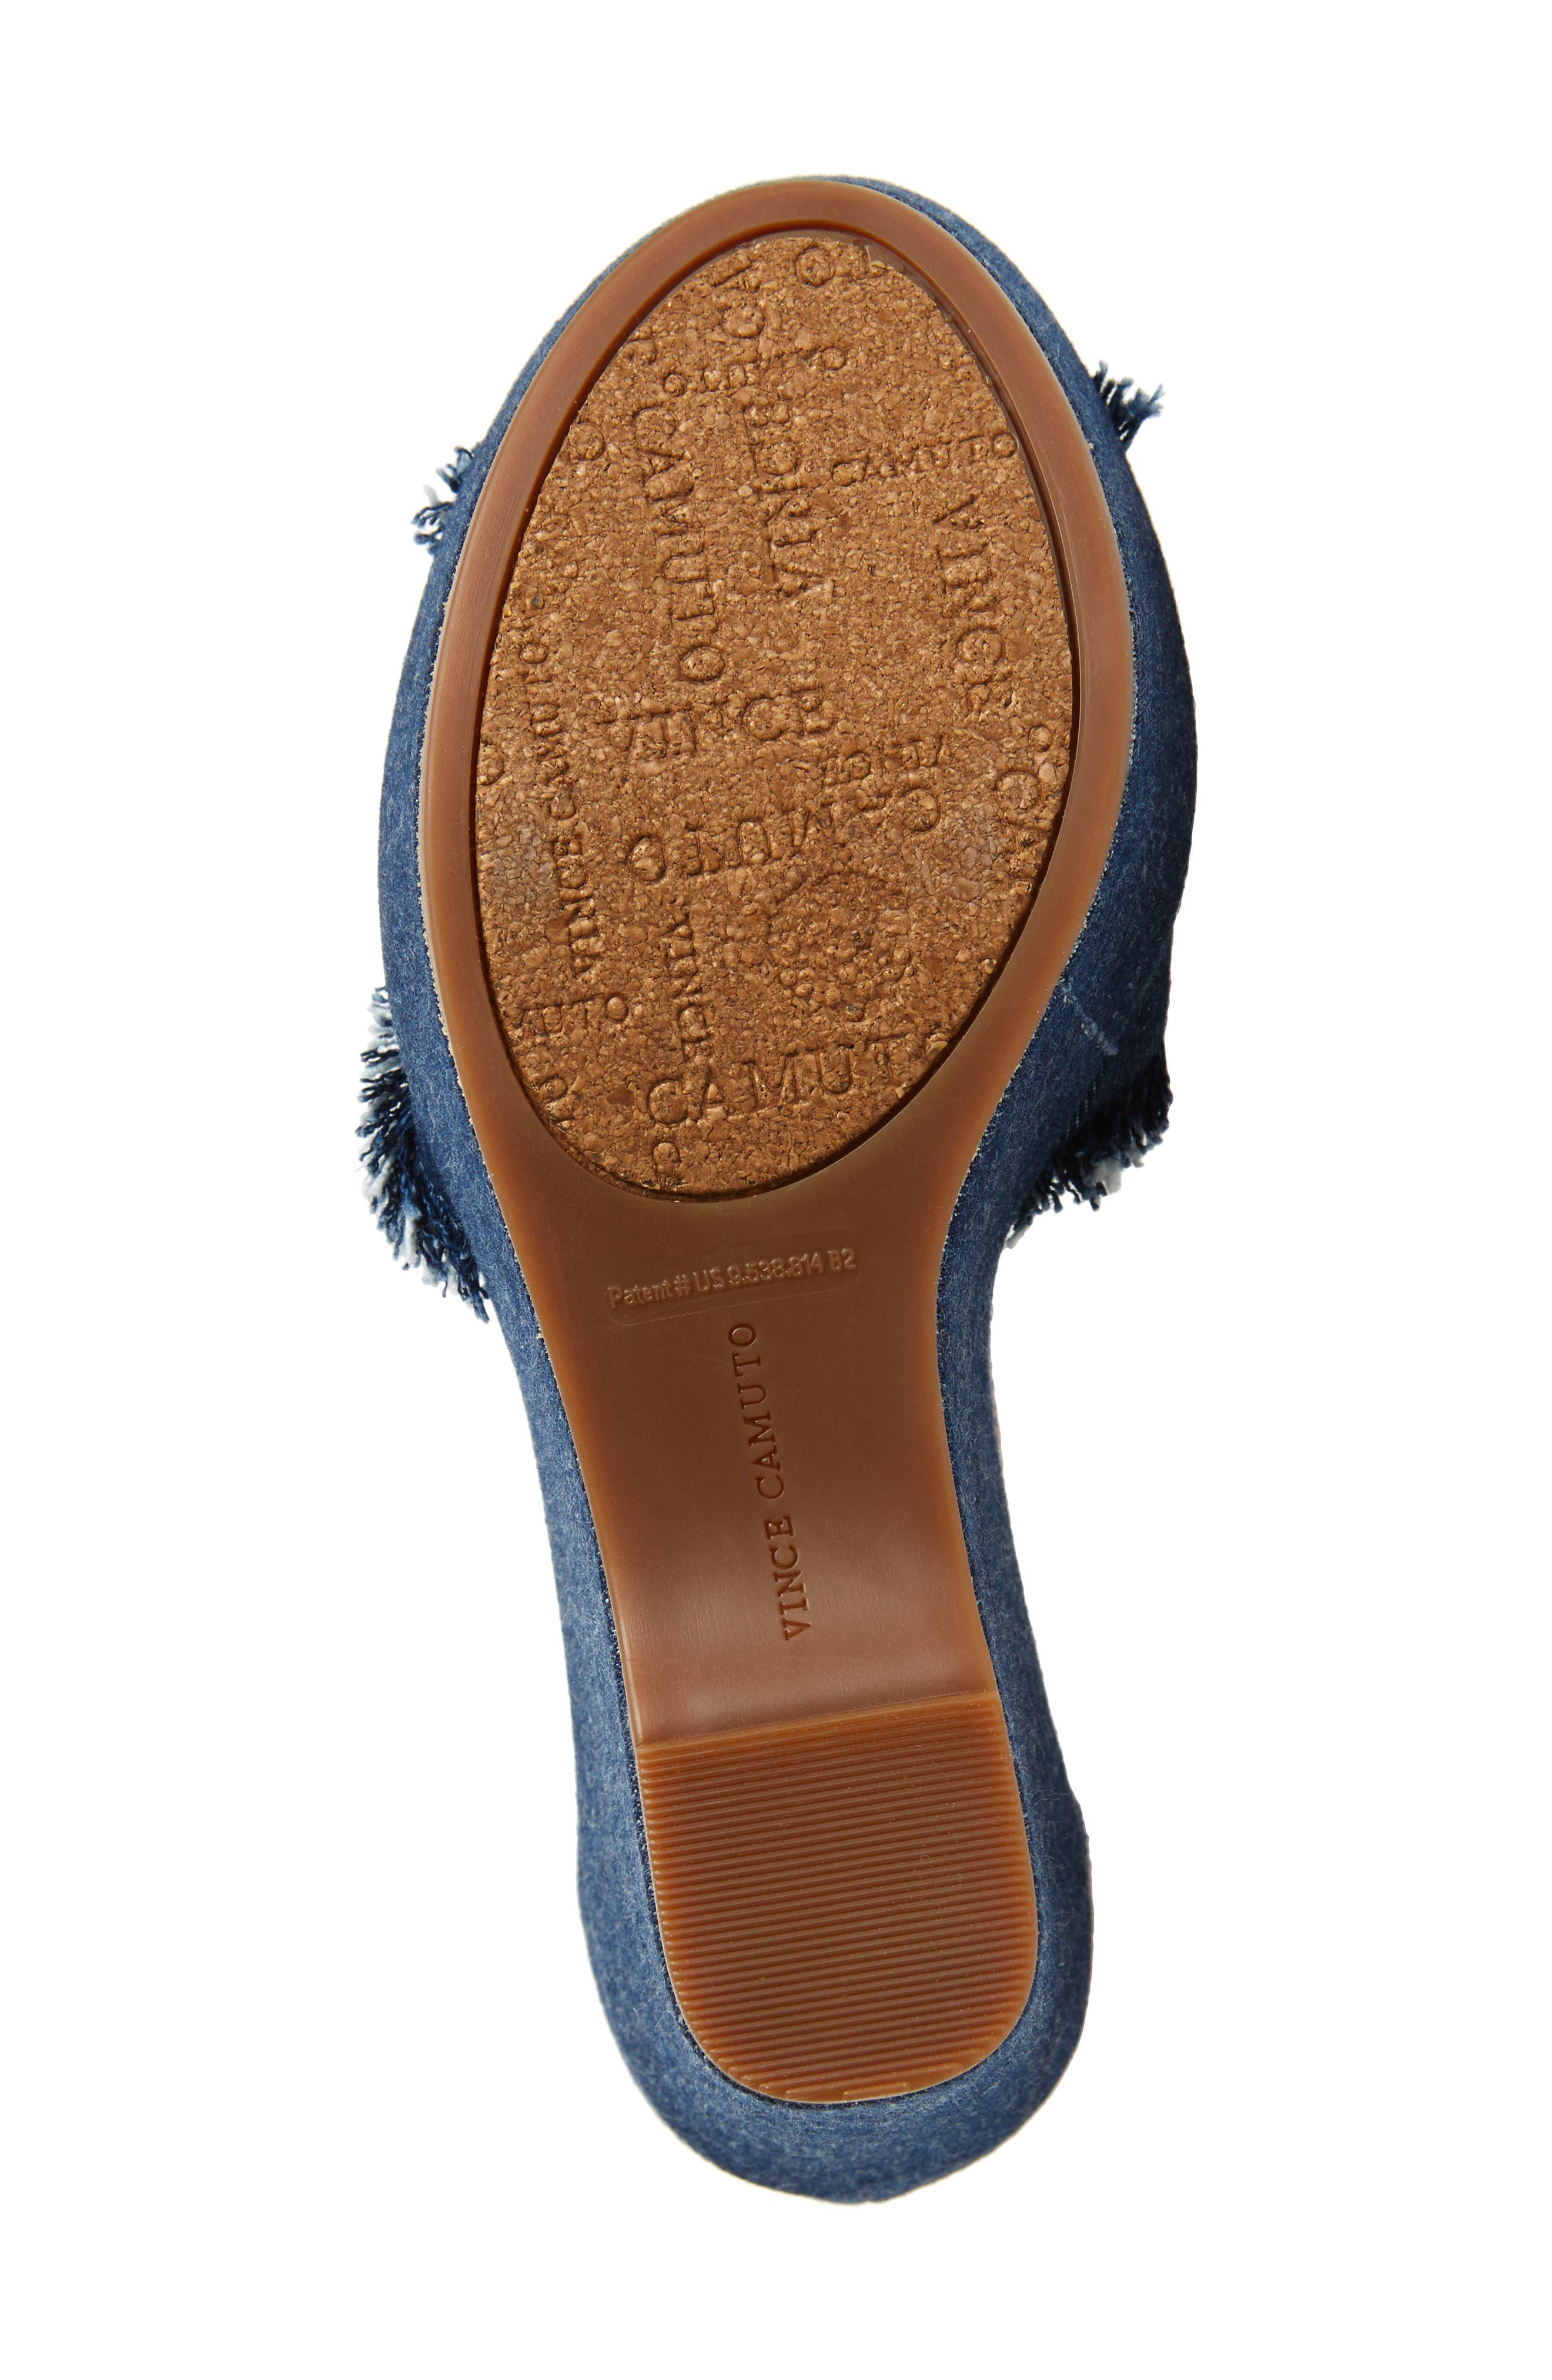 Tatchen Ankle Strap Platform Sandal,                             Alternate thumbnail 6, color,                             Dark Blue Denim